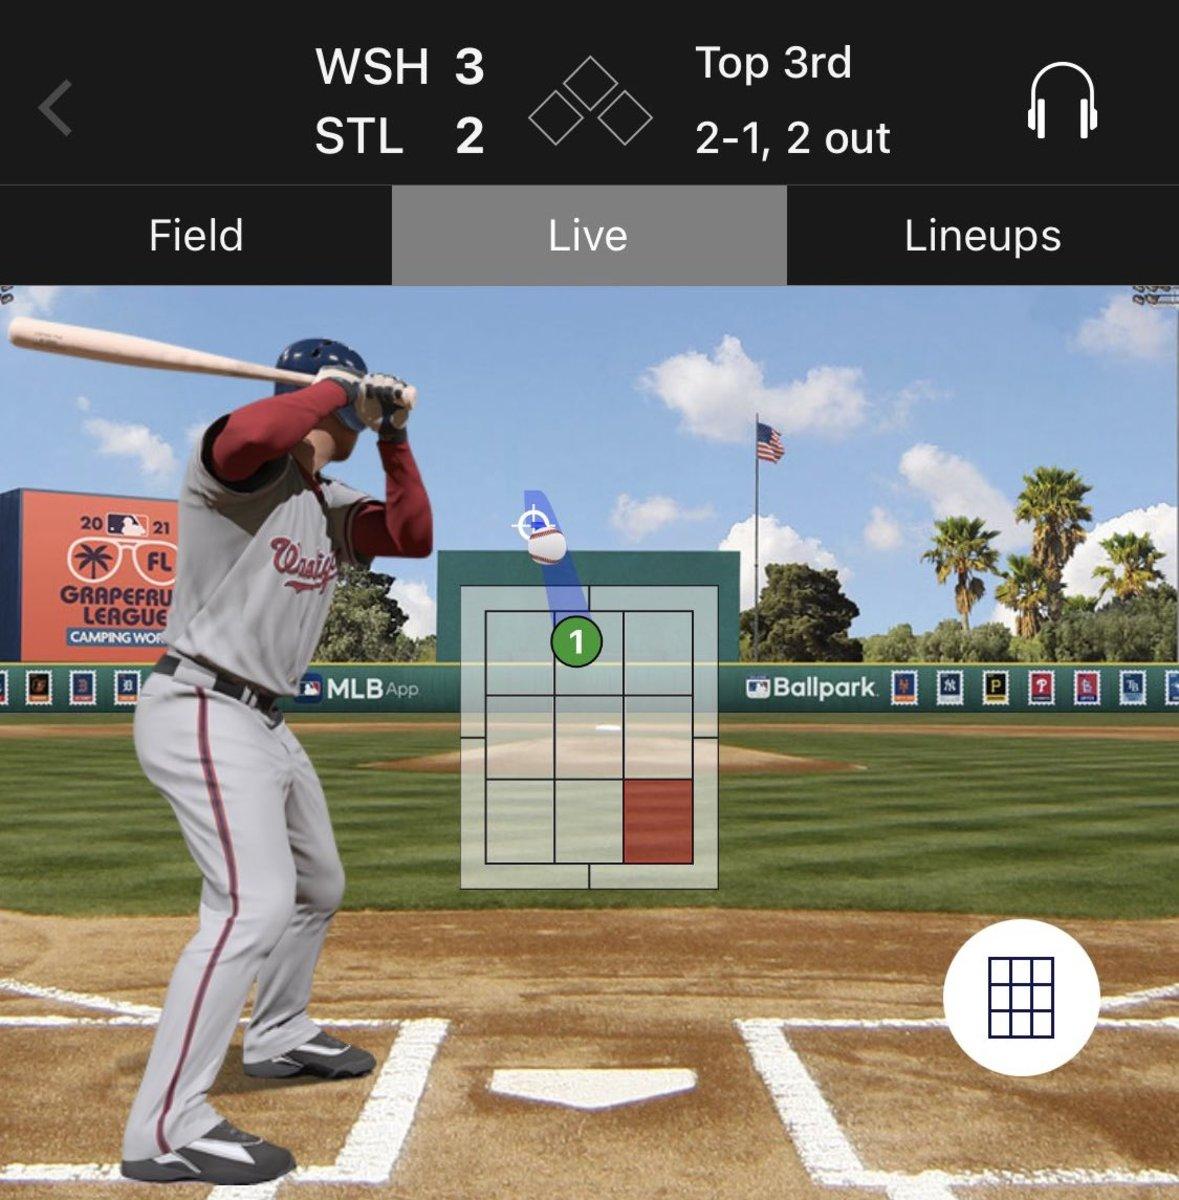 Screenshot from MLB Gameday